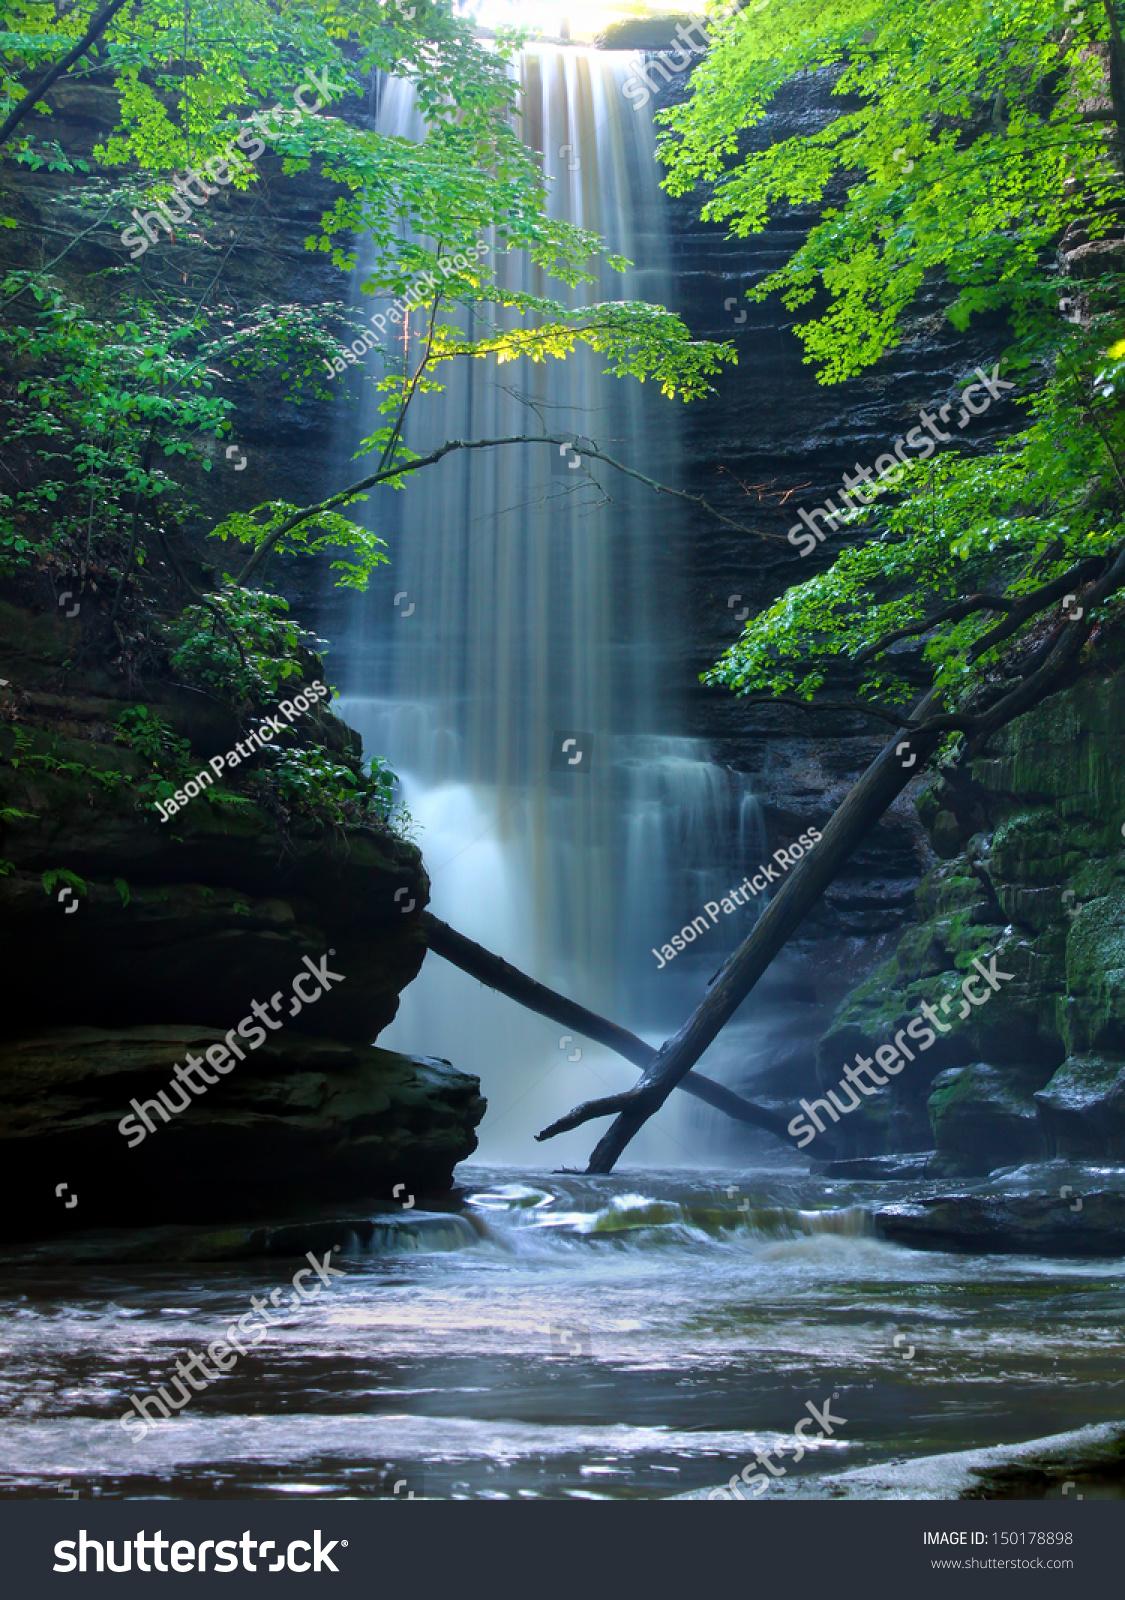 waterfall, lake, forest - Beautiful views wallpapers: 1600x900